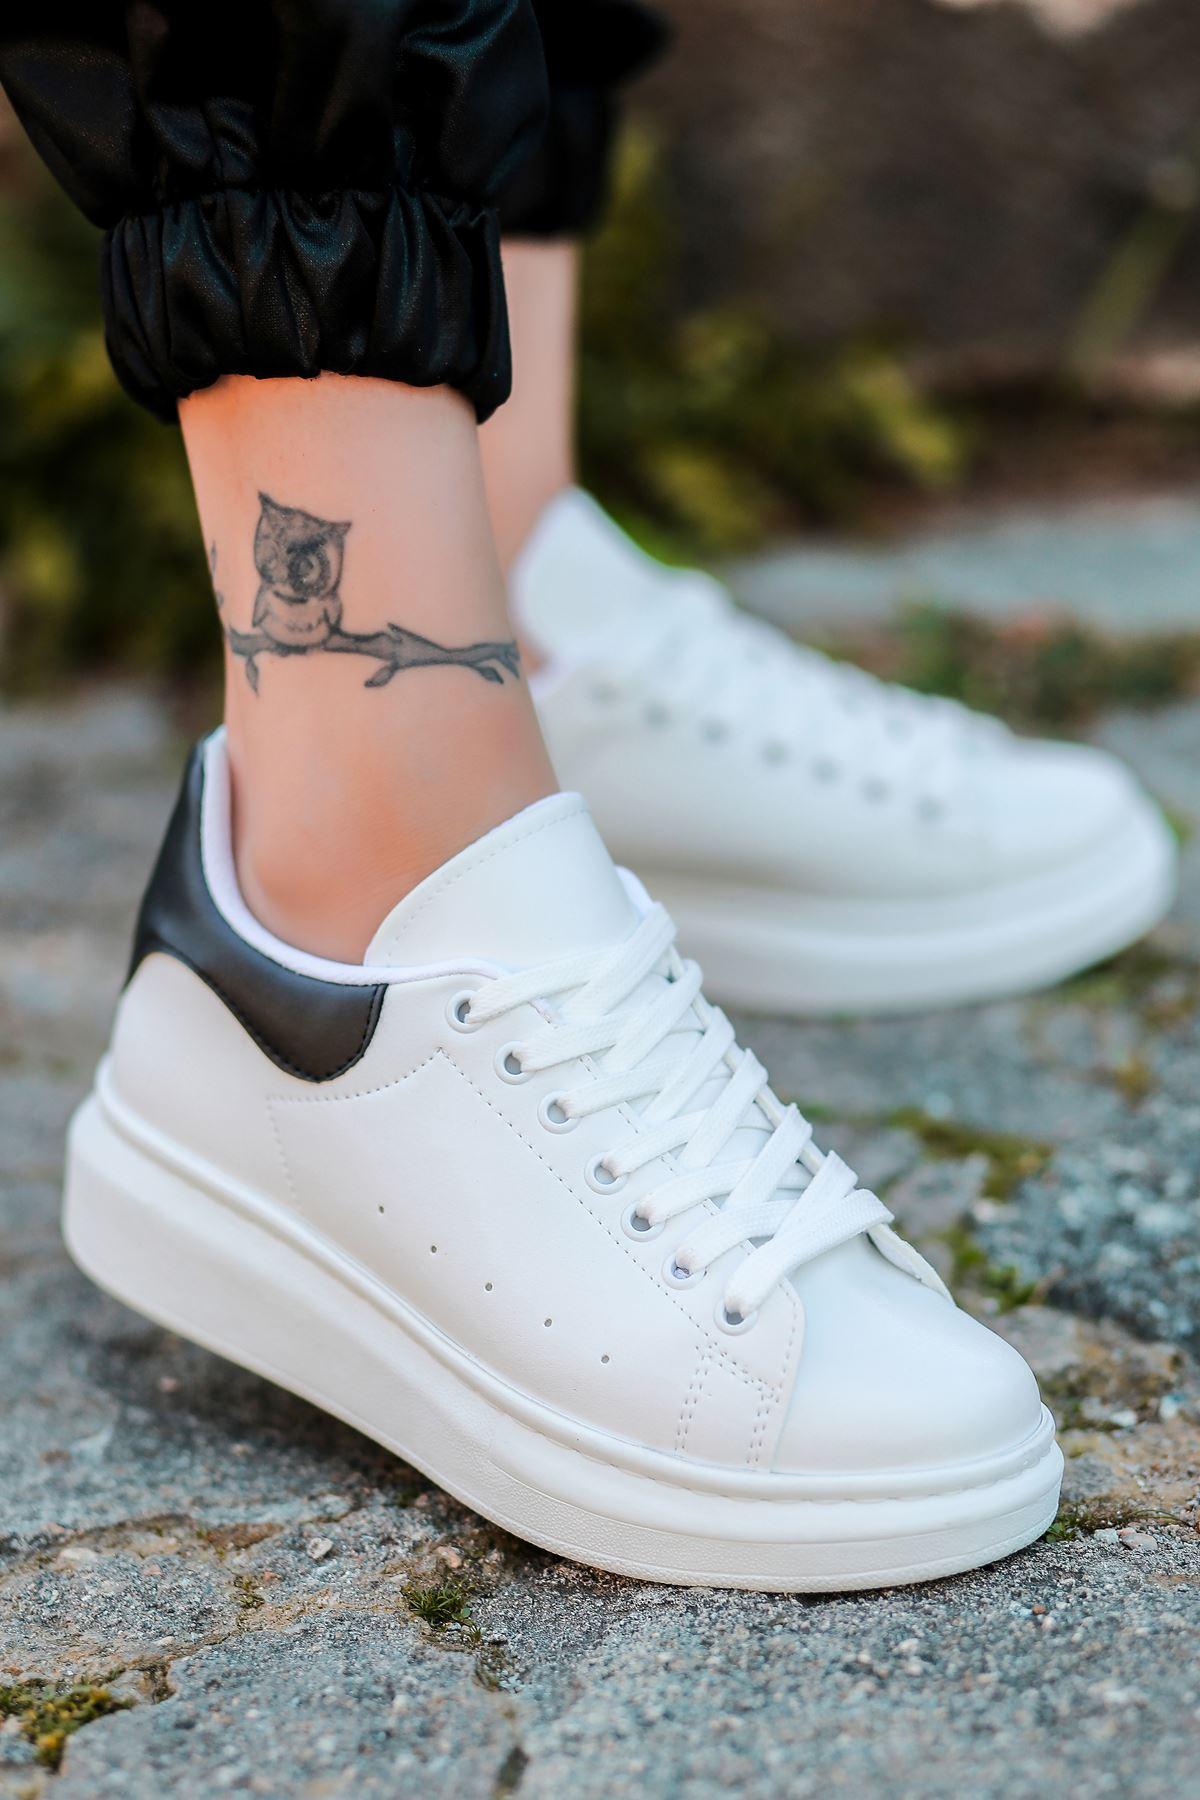 Lucy Mat Deri Siyah Cilt Detay Sneakers Beyaz